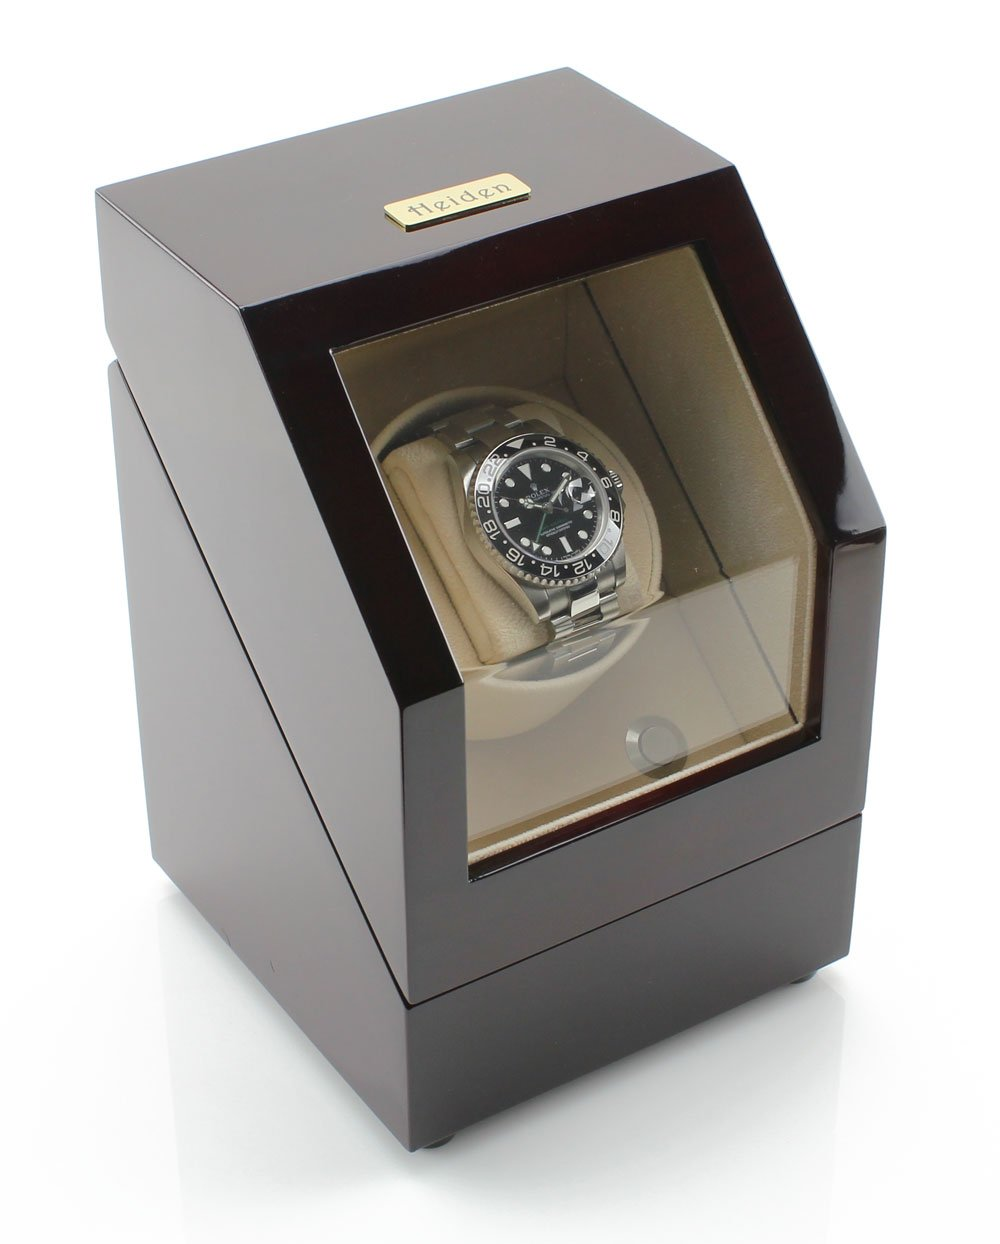 Heiden Battery Powered Single Watch Winder in Cherrywood